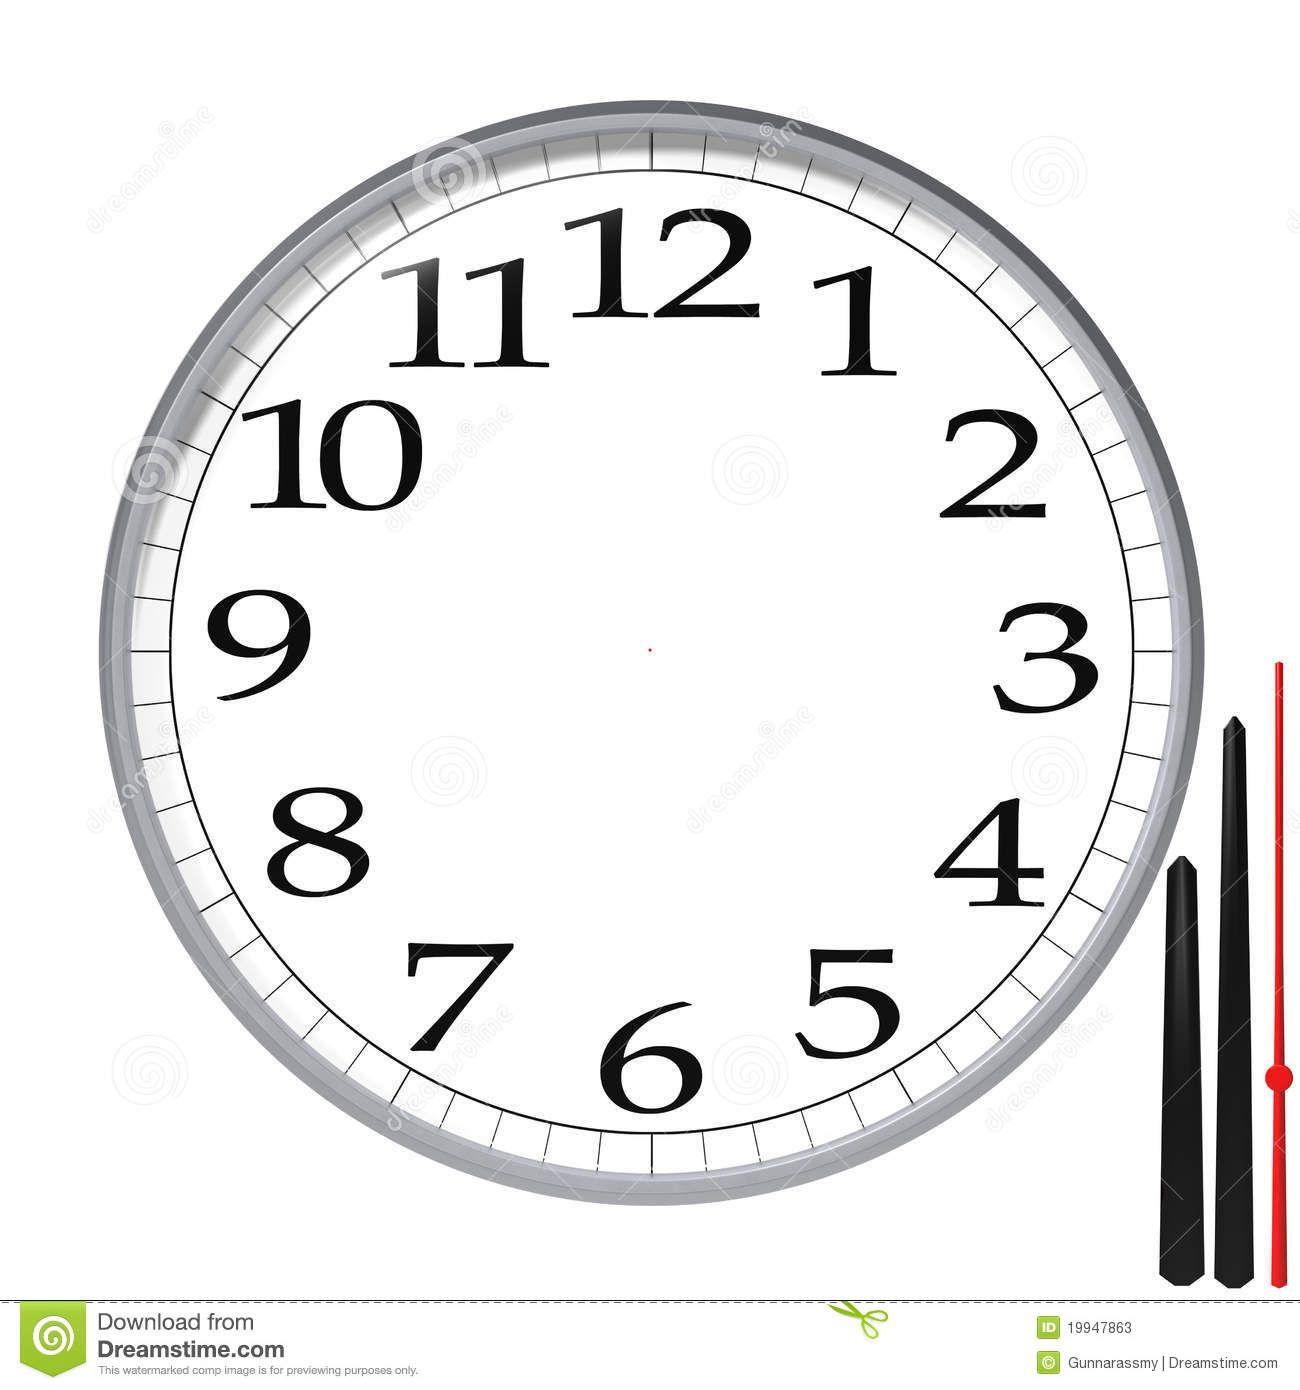 Clock Template  Google Search  So Skool    Clocks